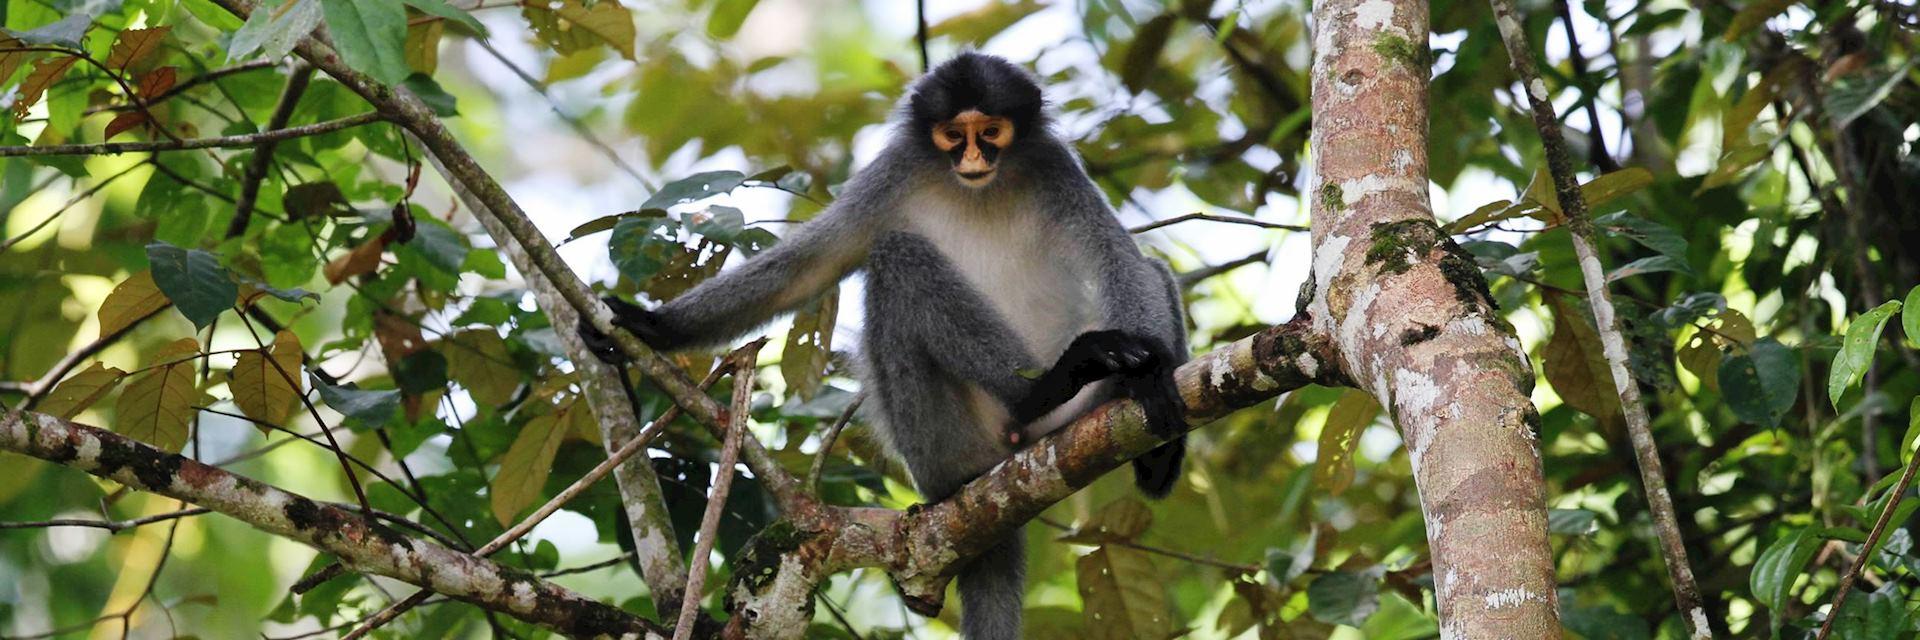 Gibbon, Malaysian Borneo